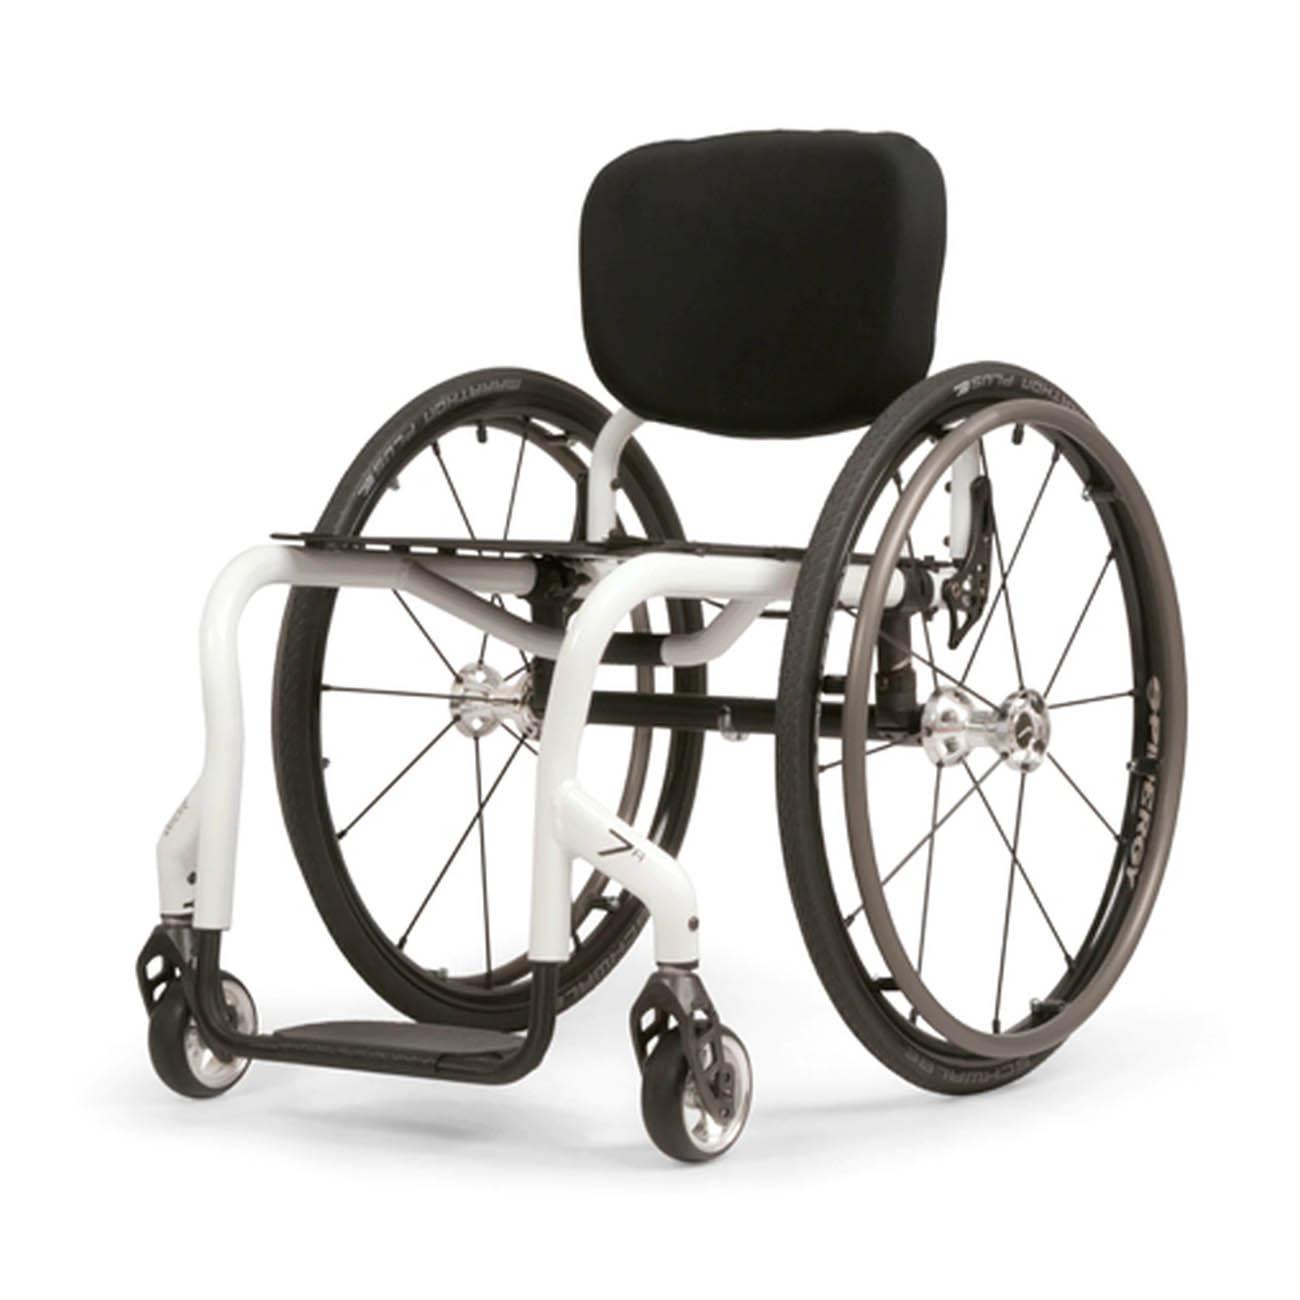 Quickie 7RS rigid ultralight manual wheelchair